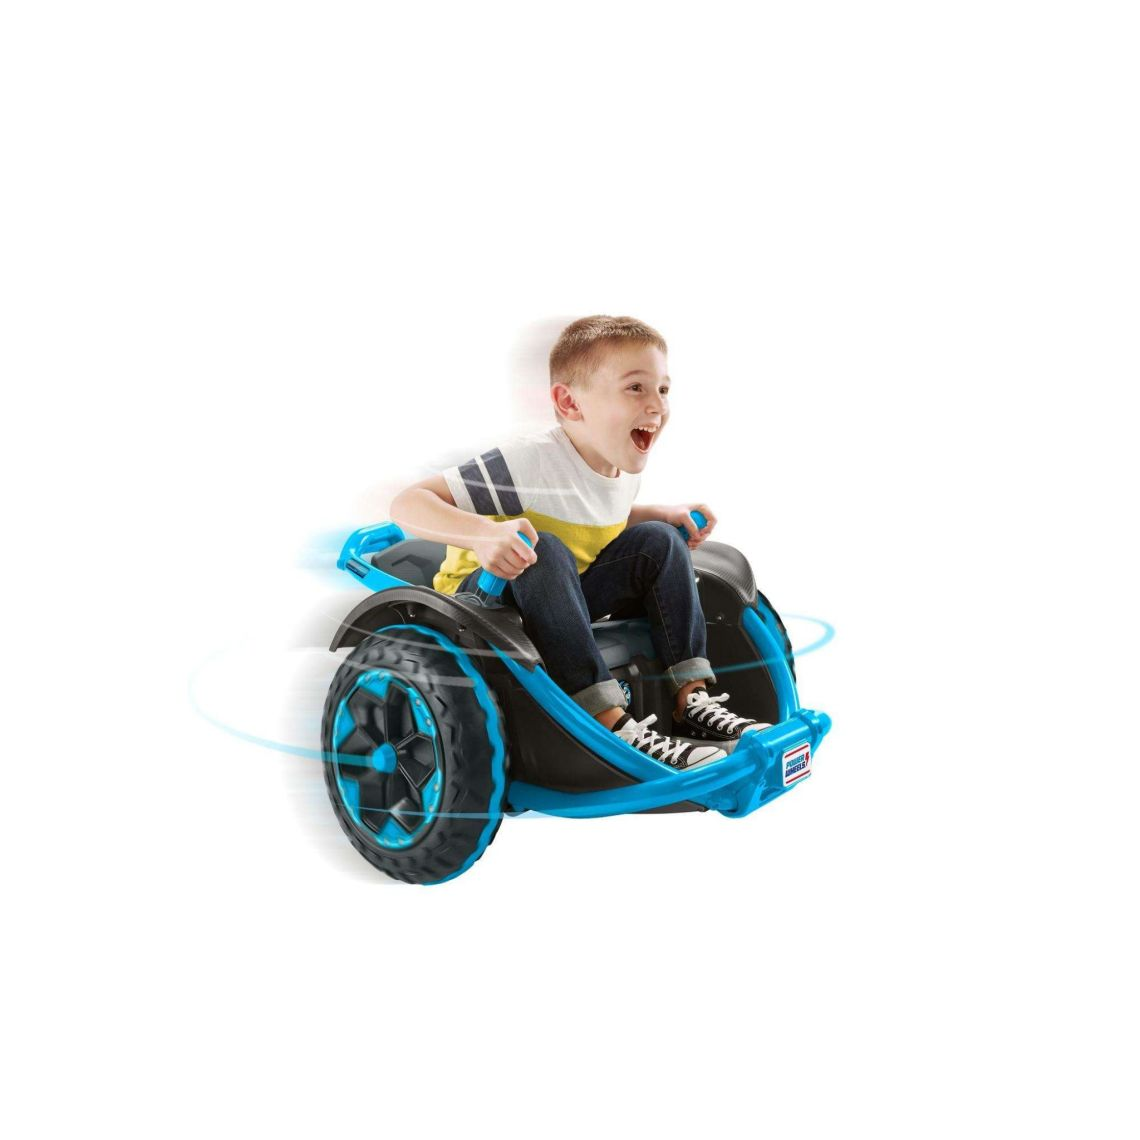 Power Wheels Wild Thing 12V Battery-Powered Ride On, Blue - Walmart.com